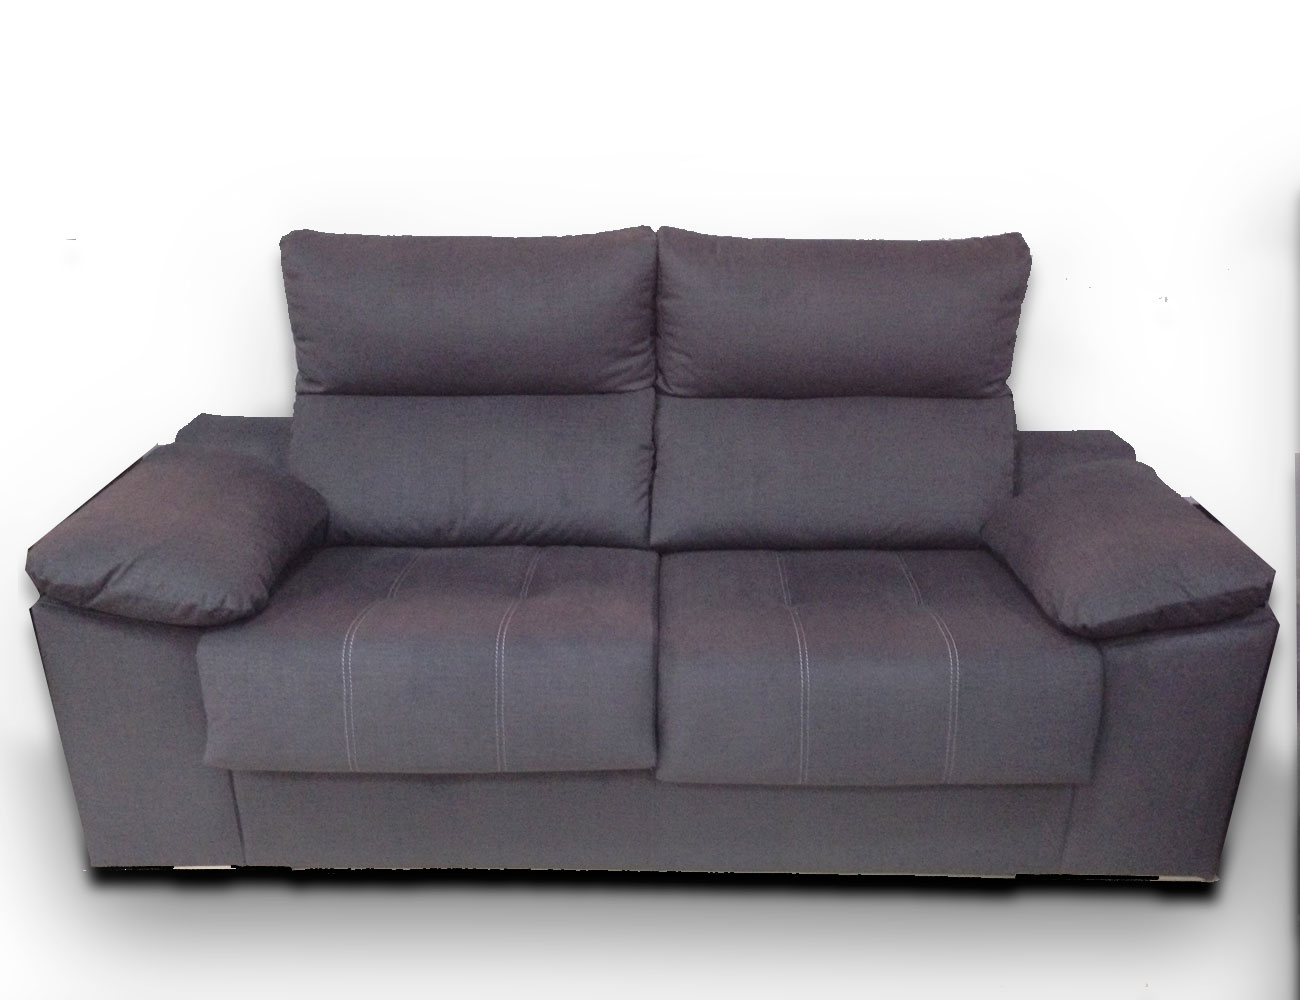 Sofa 3 plazas4